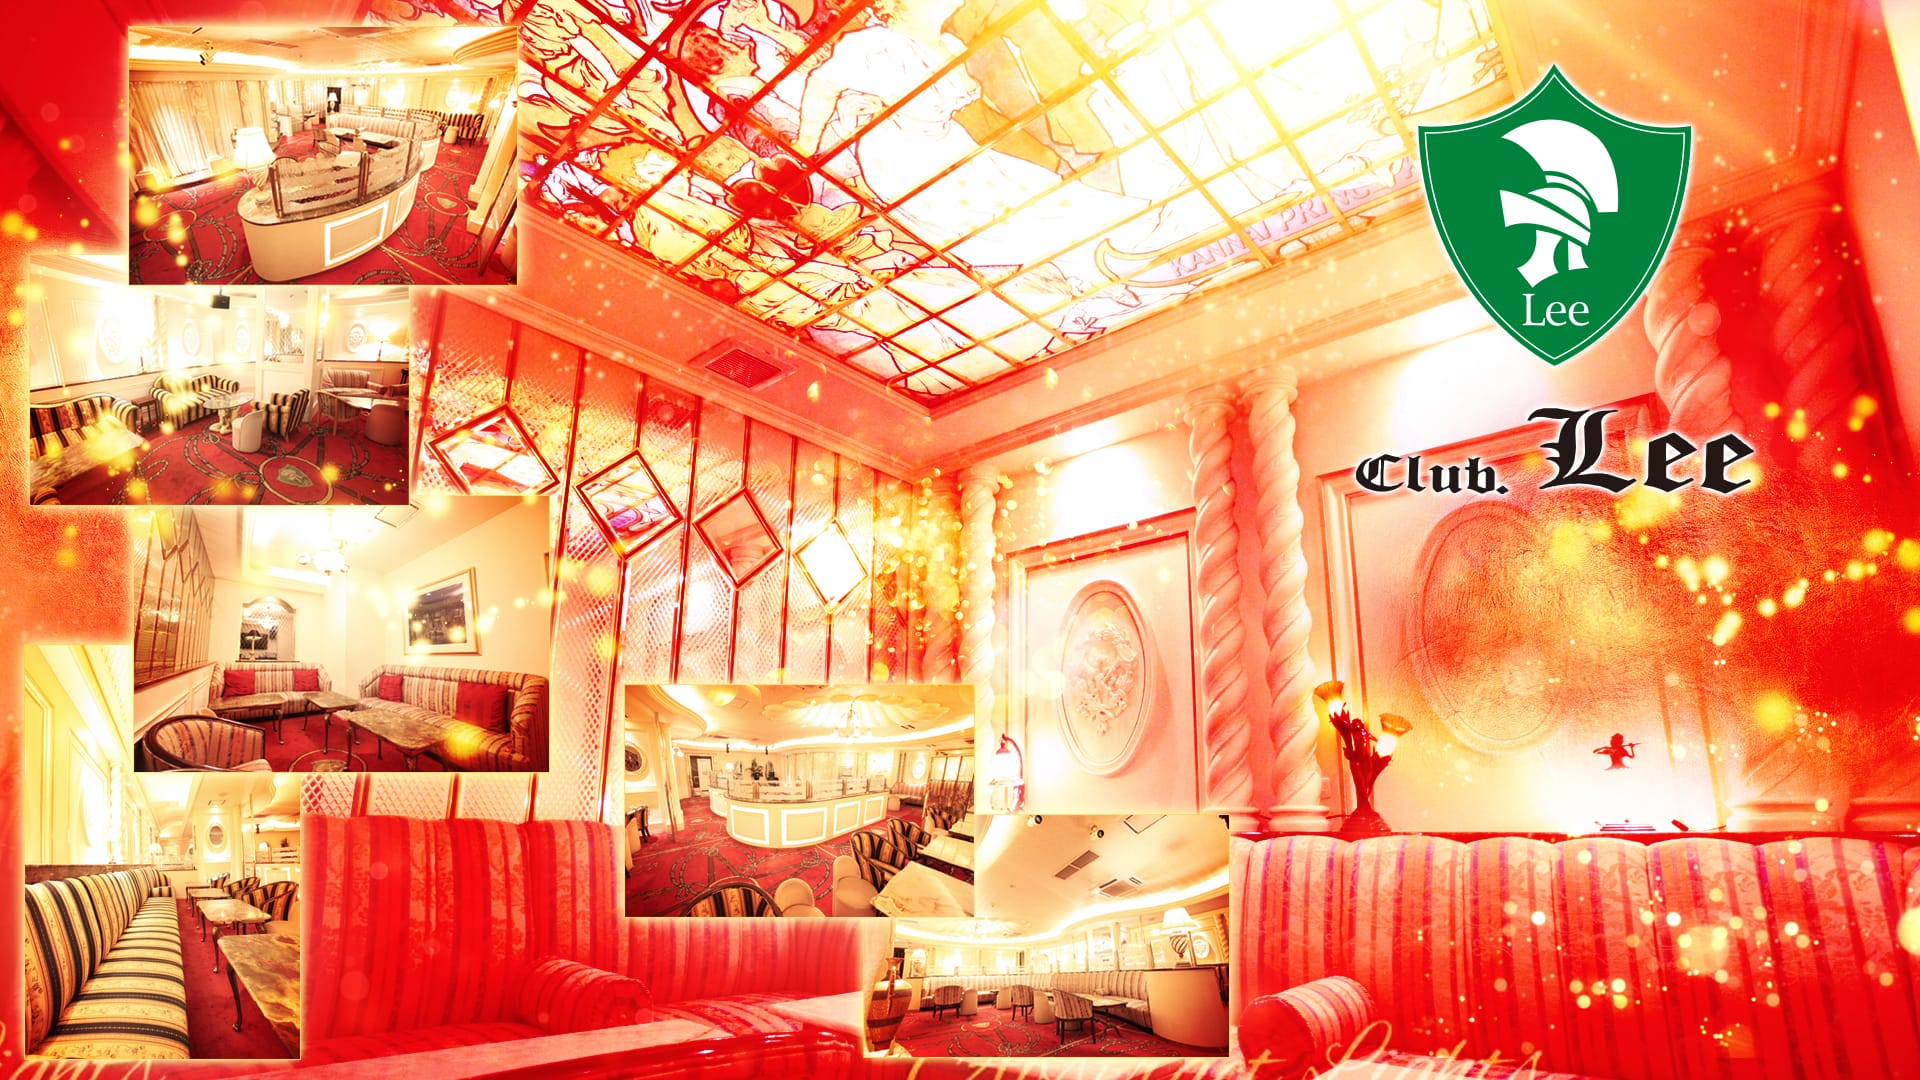 Club Lee~クラブリー~ 関内クラブ TOP画像